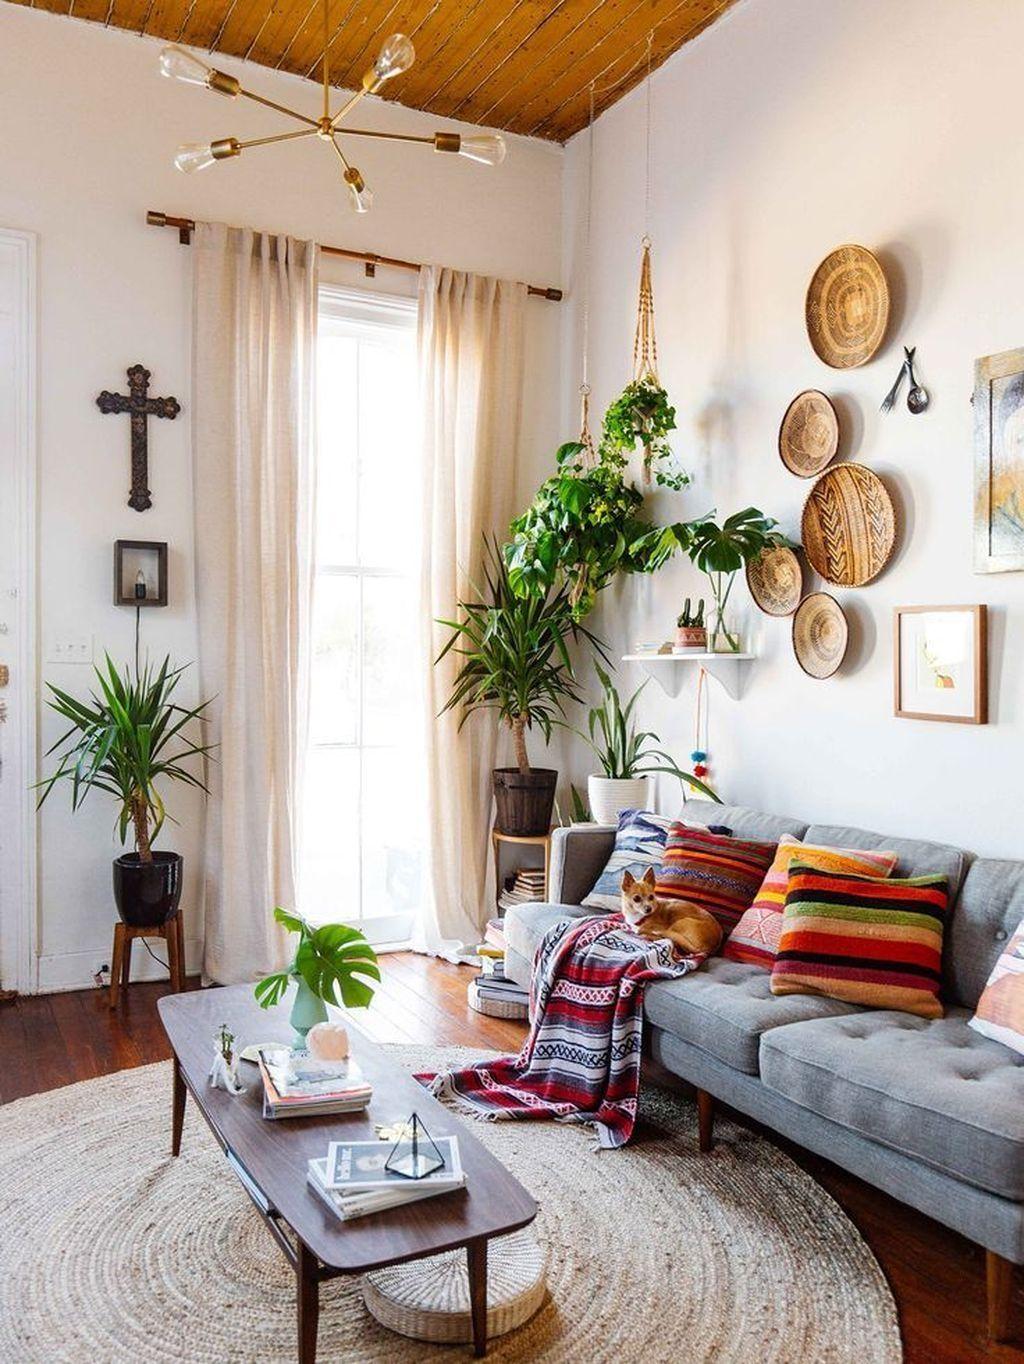 30 Luxurious Living Room Design Ideas: 30+ Luxurious Modern Living Room Decor Ideas